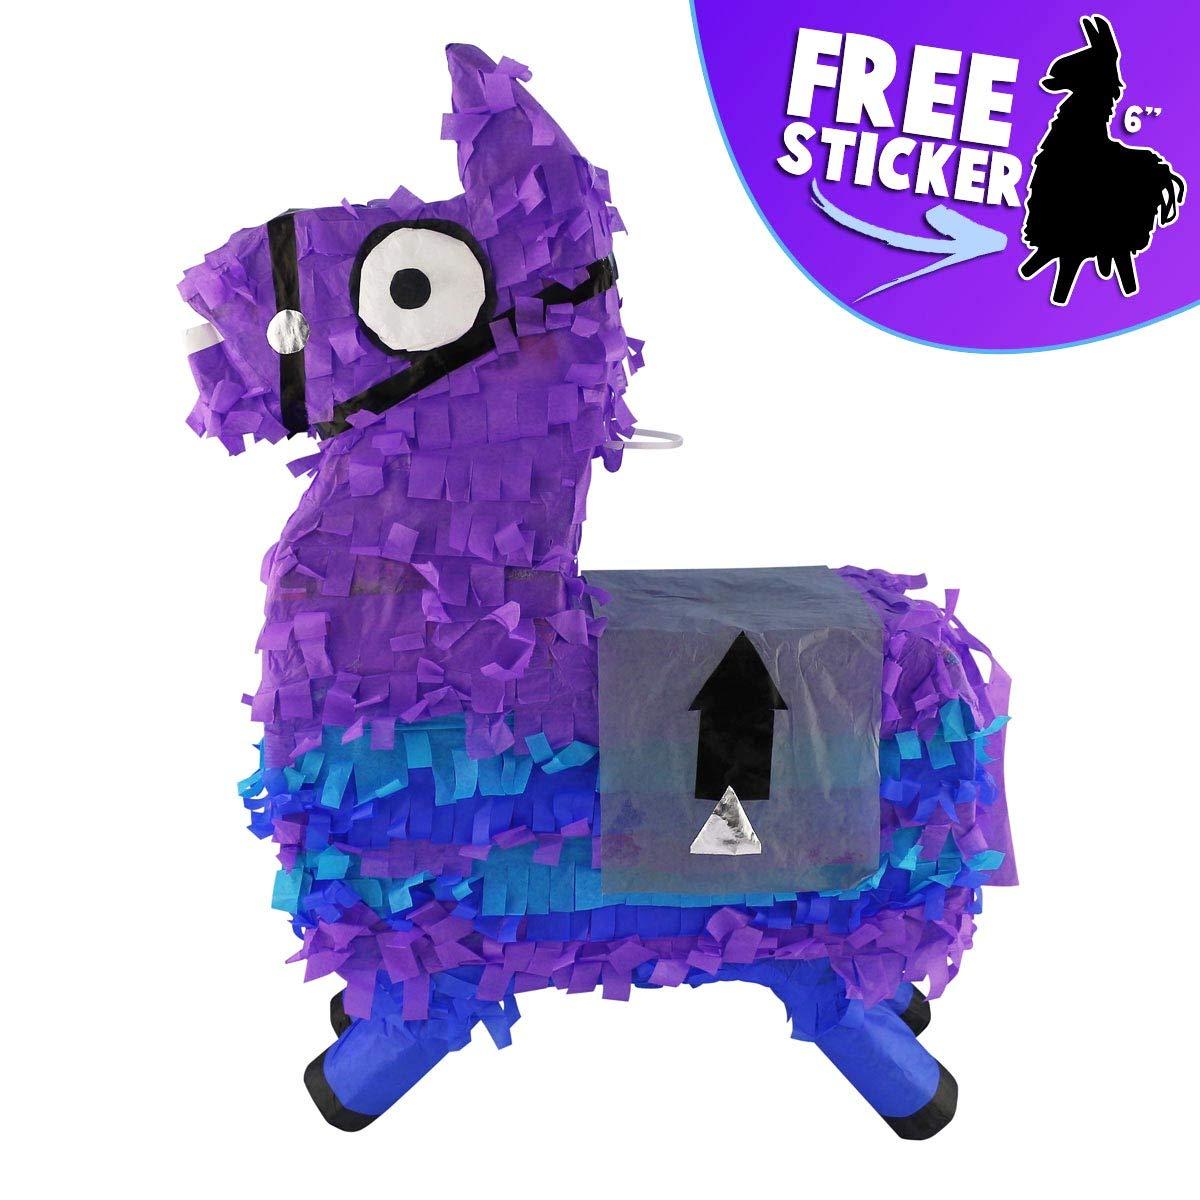 Aurabeam Loot Llama Party Pinata (Purple Loot Llama Piñata) Hand made in Mexico by Aurabeam